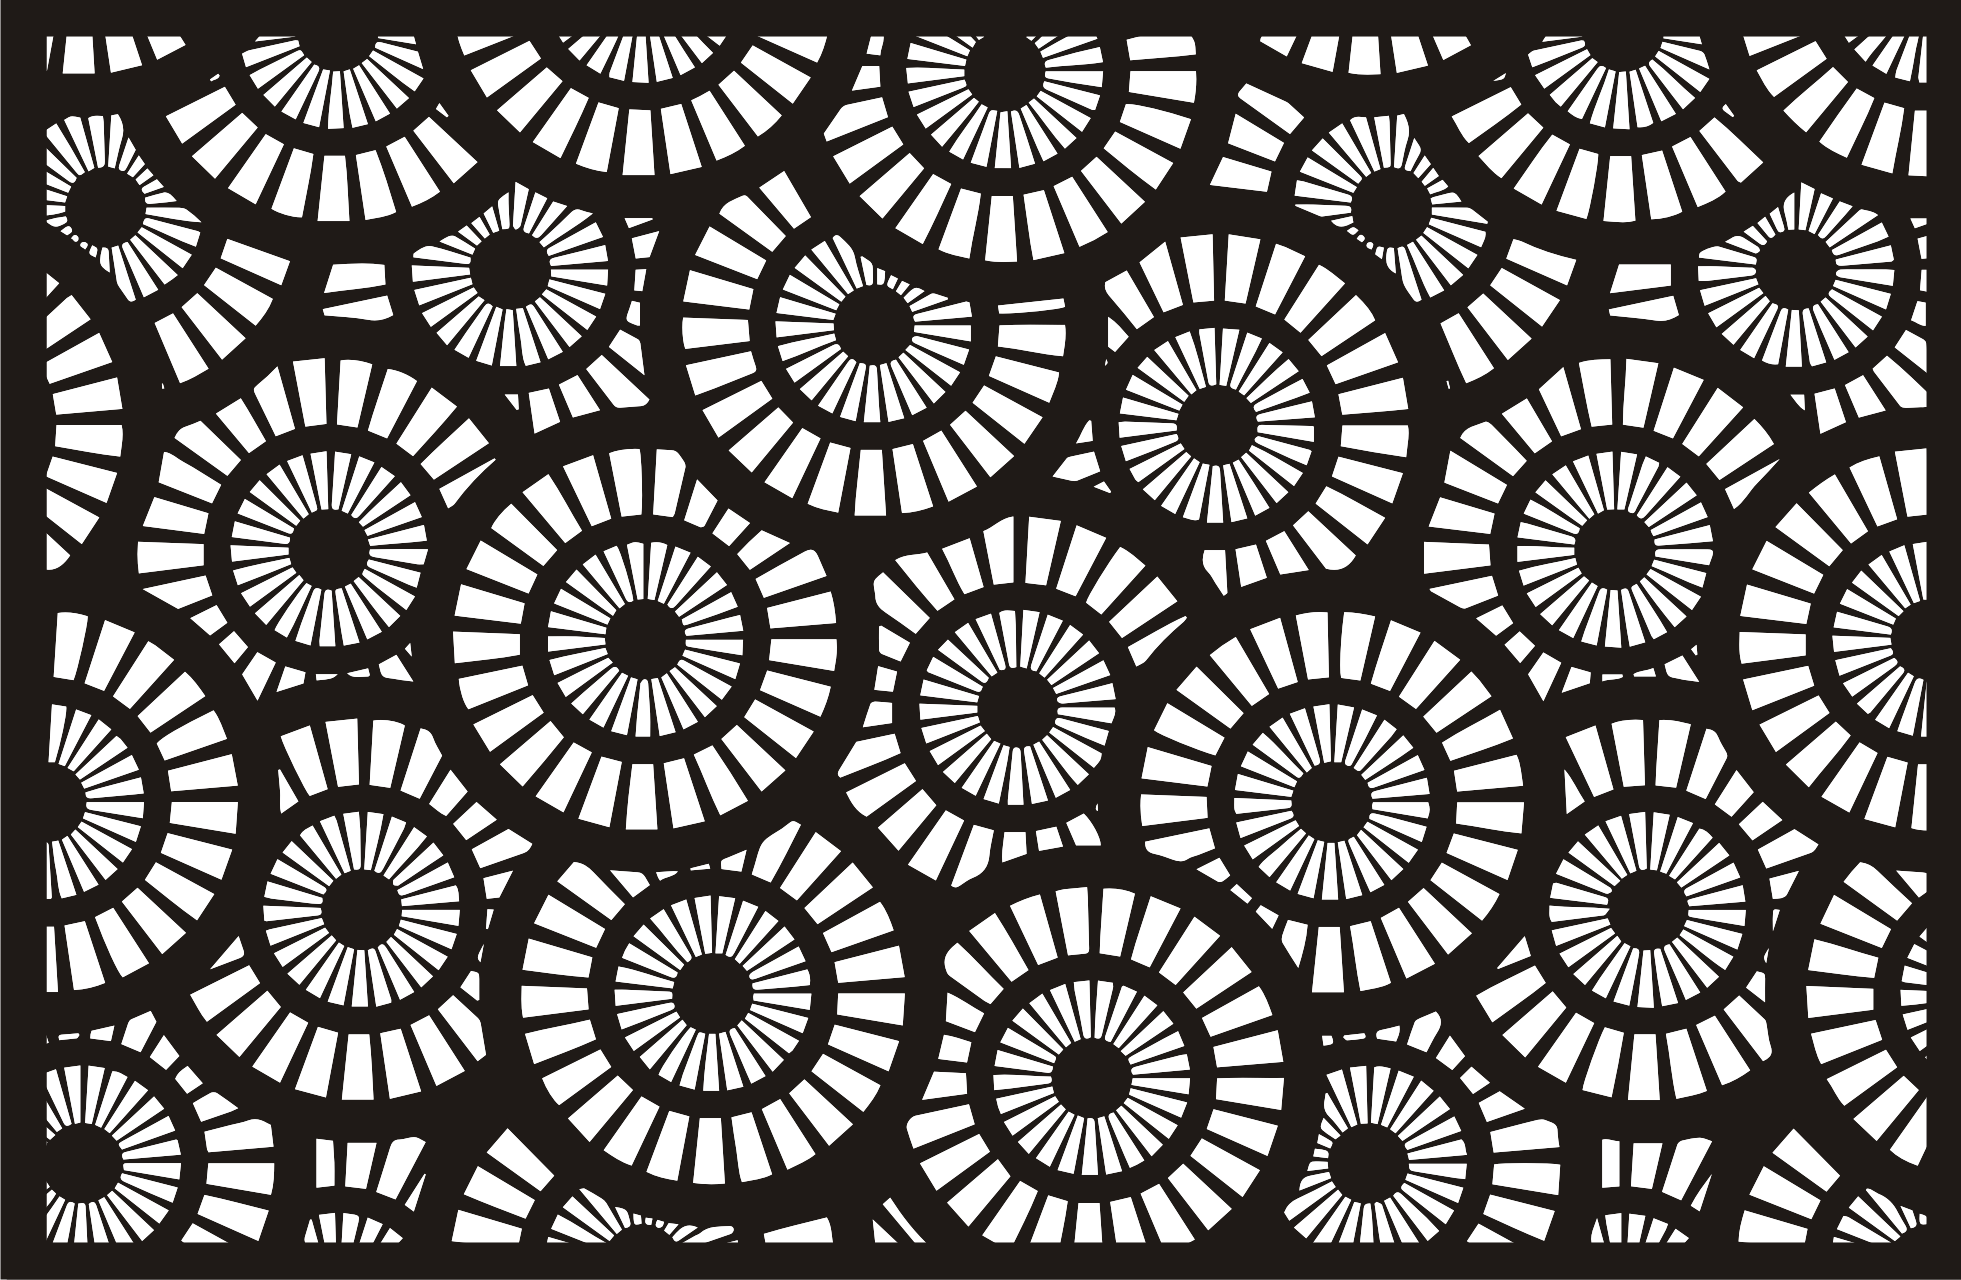 Lasergram Cerchi - Wall Decor - Black Acrylic